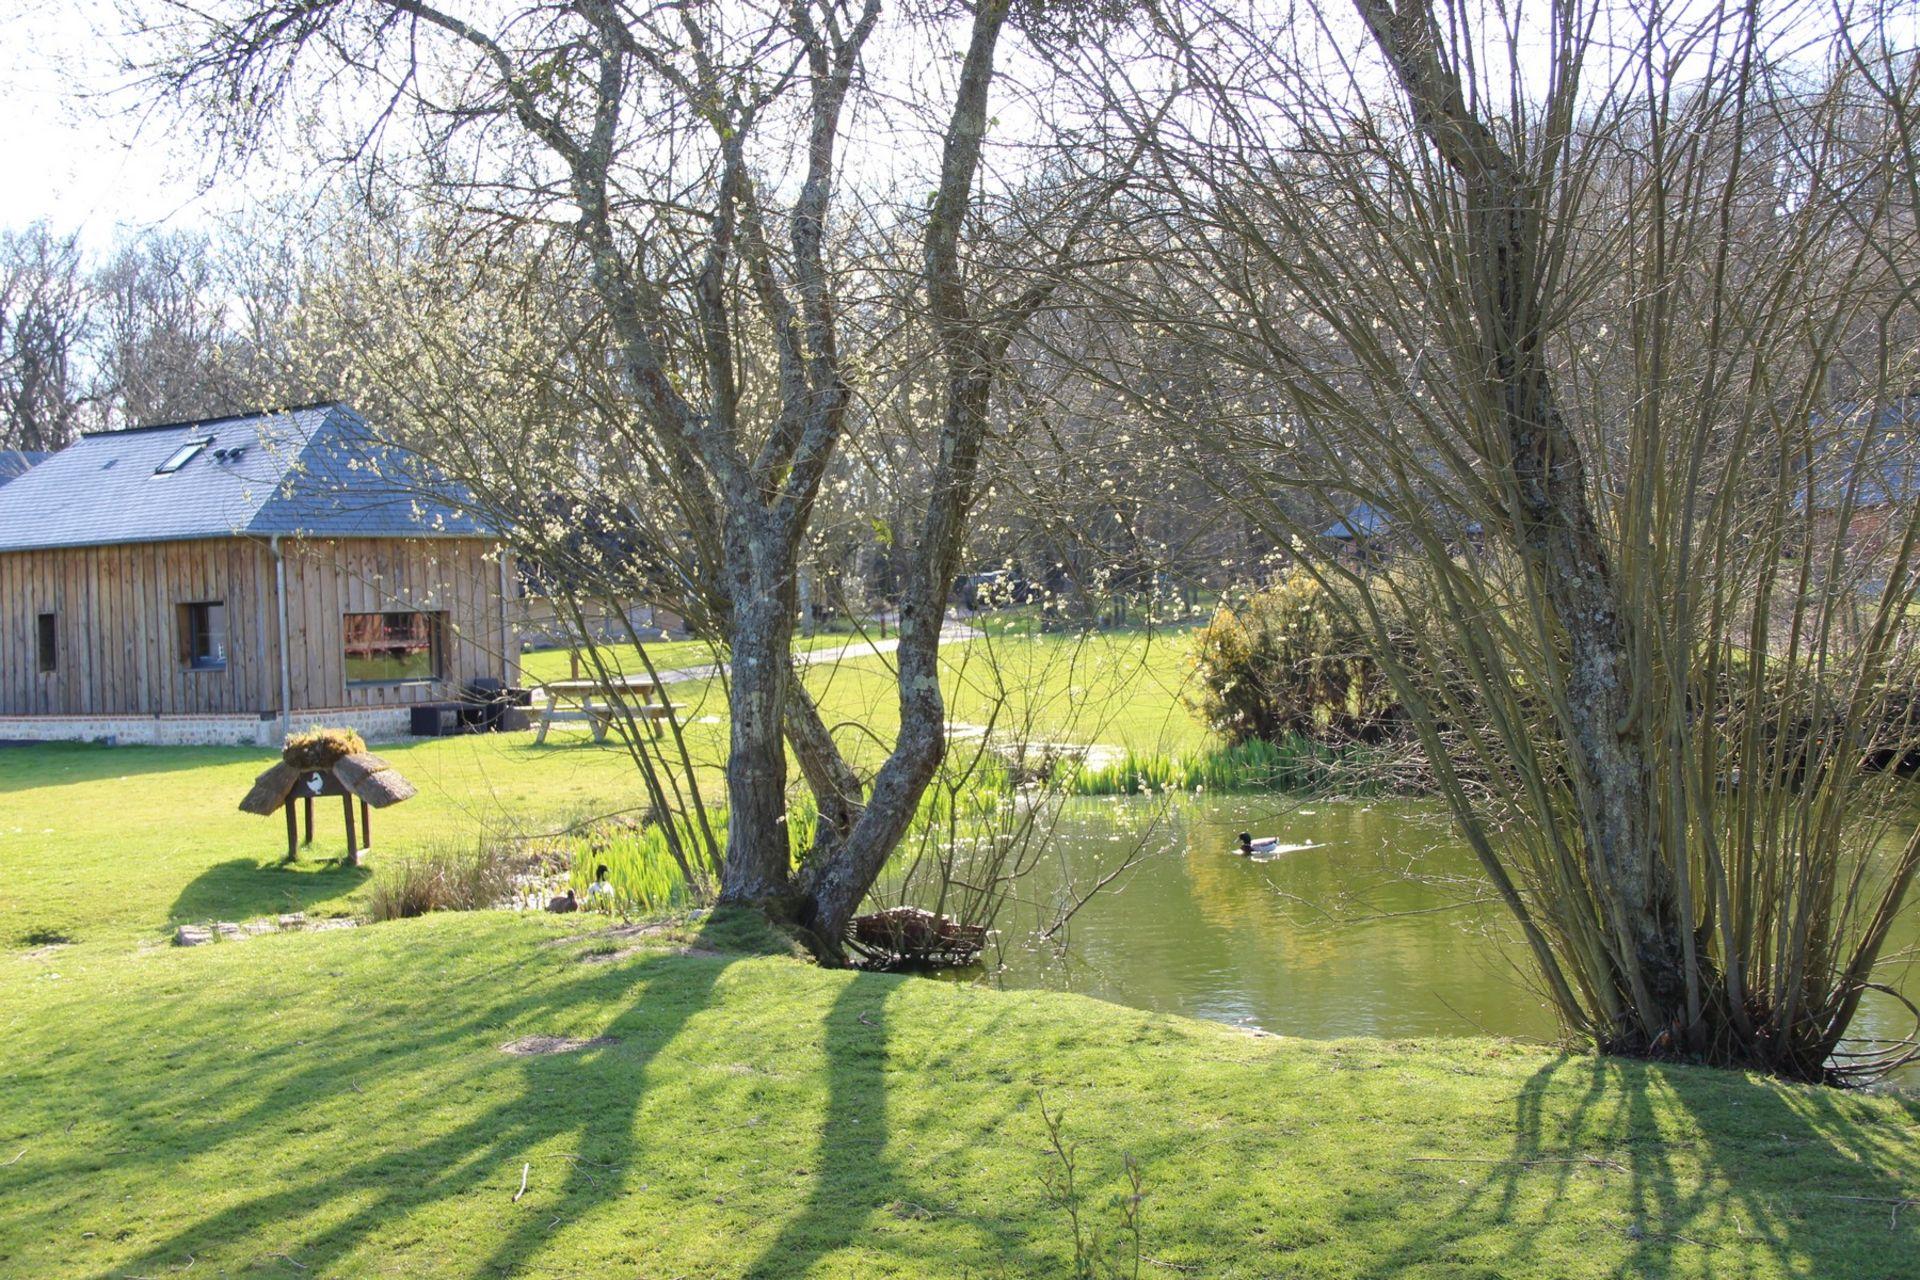 Bekijk vakantiehuis la petite maison de rose in eure - La petite maison normandie ...